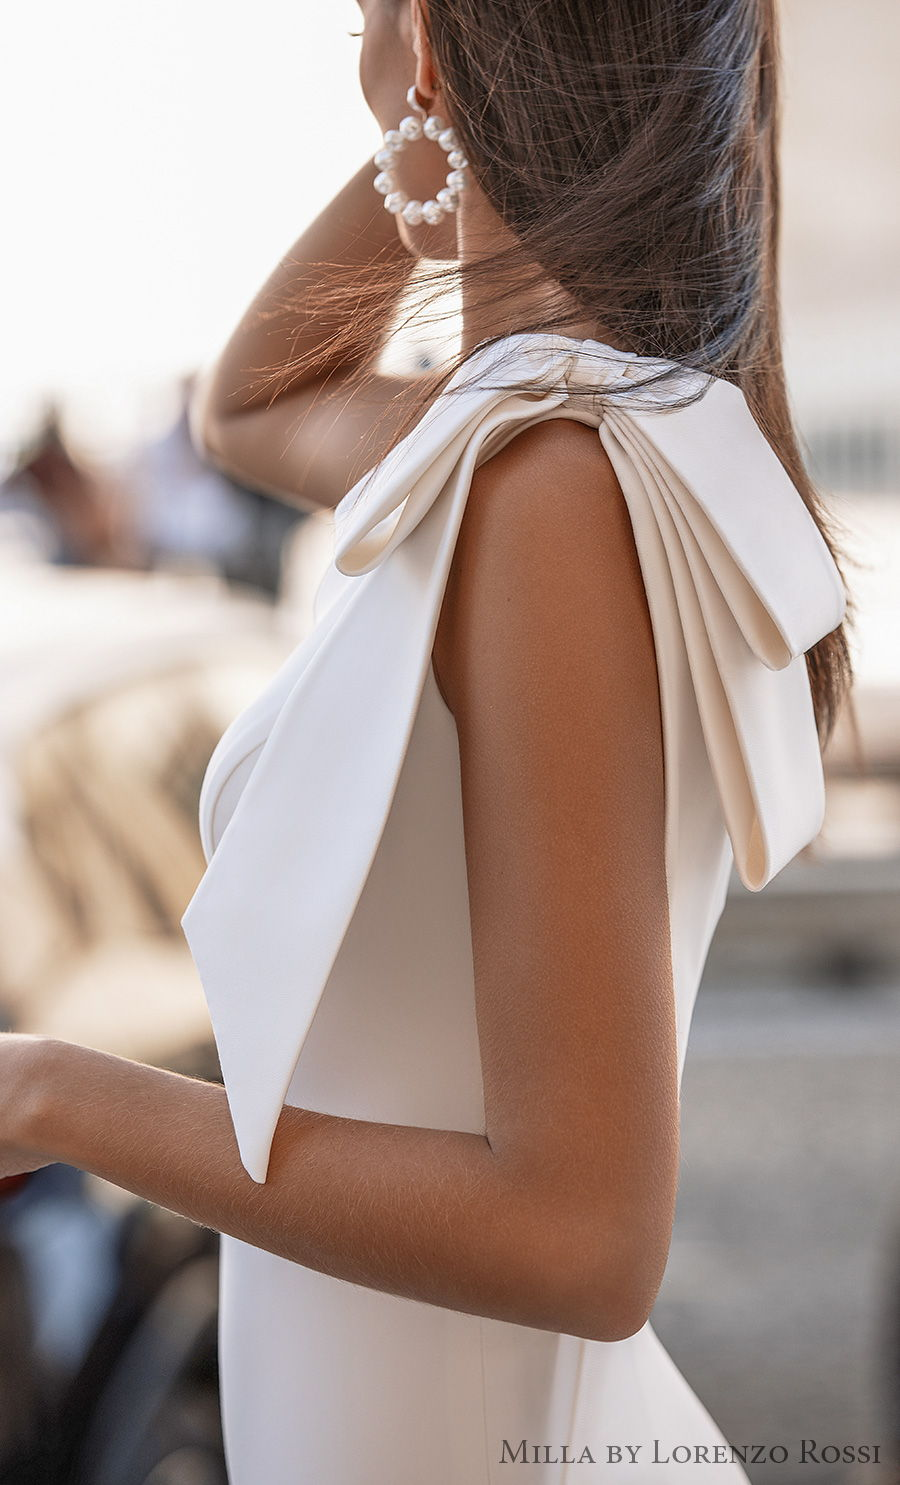 milla lorenzo rossi 2021 bridal one shoulder ribbon strap simple minimalist elegant fit and flare wedding dress medium train (amandine) zsdv